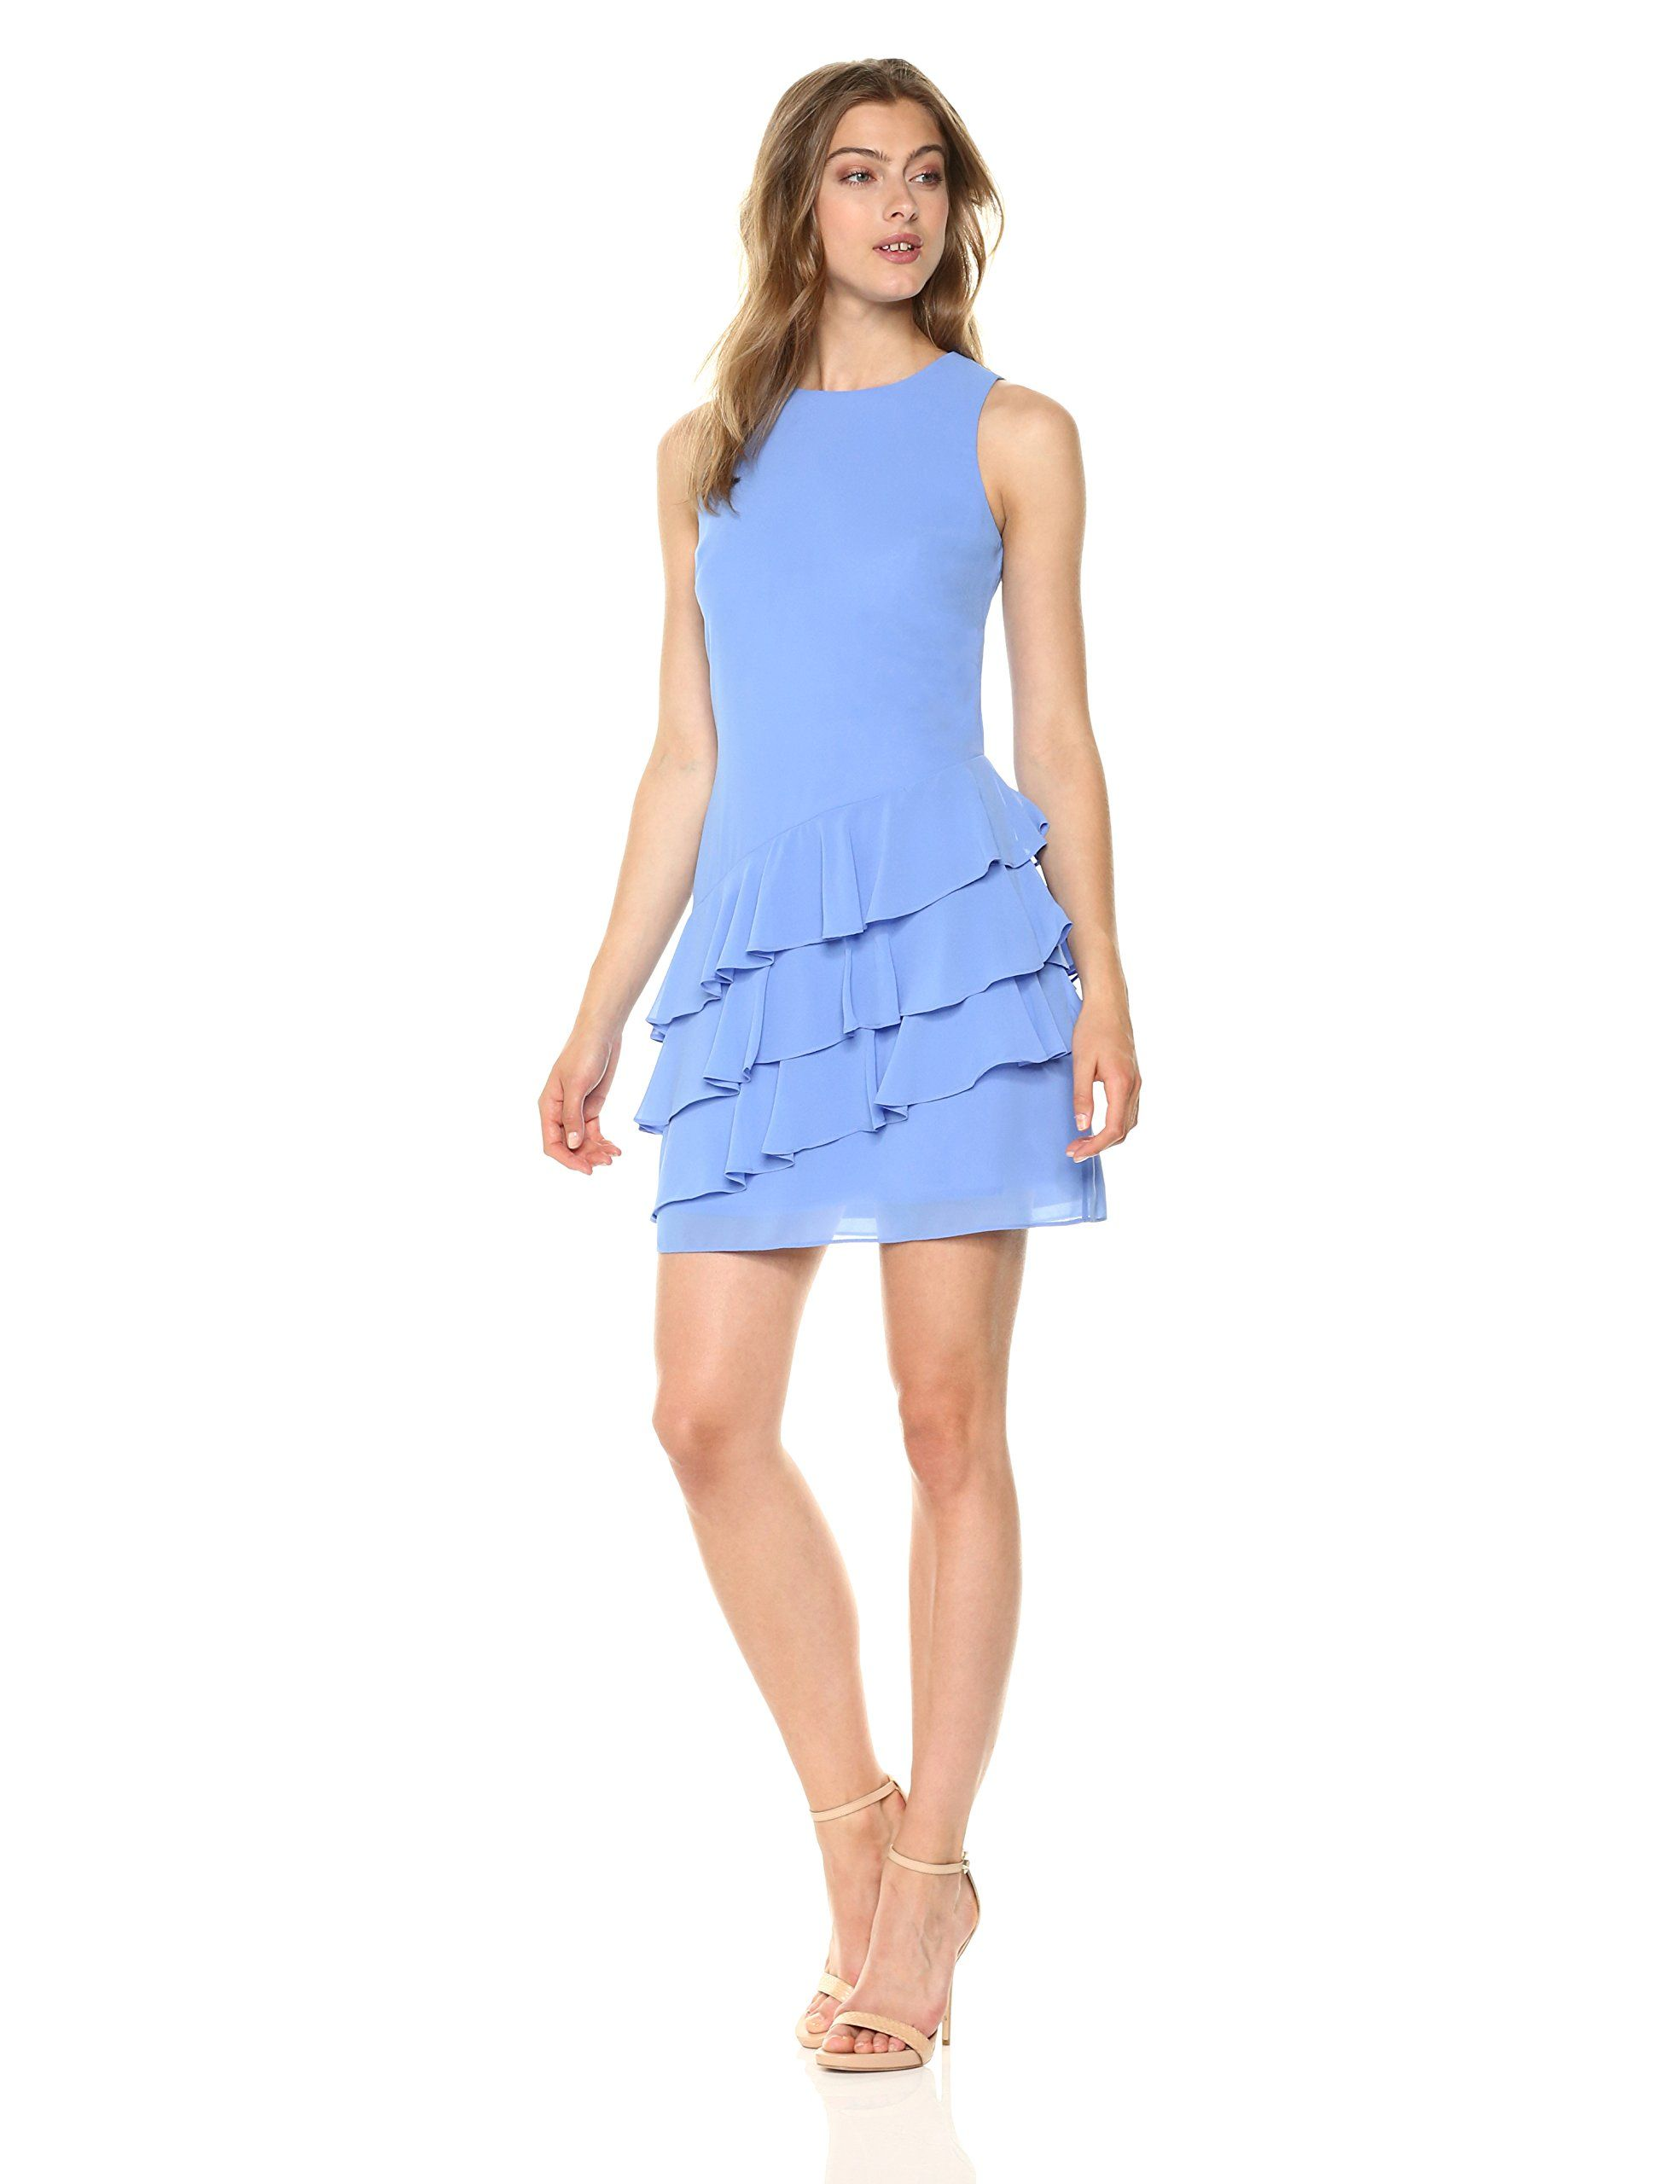 Vince Camuto Womens Chiffon Periwinkle Chiffon Ruffle Dresses Clothes [ 2560 x 1969 Pixel ]